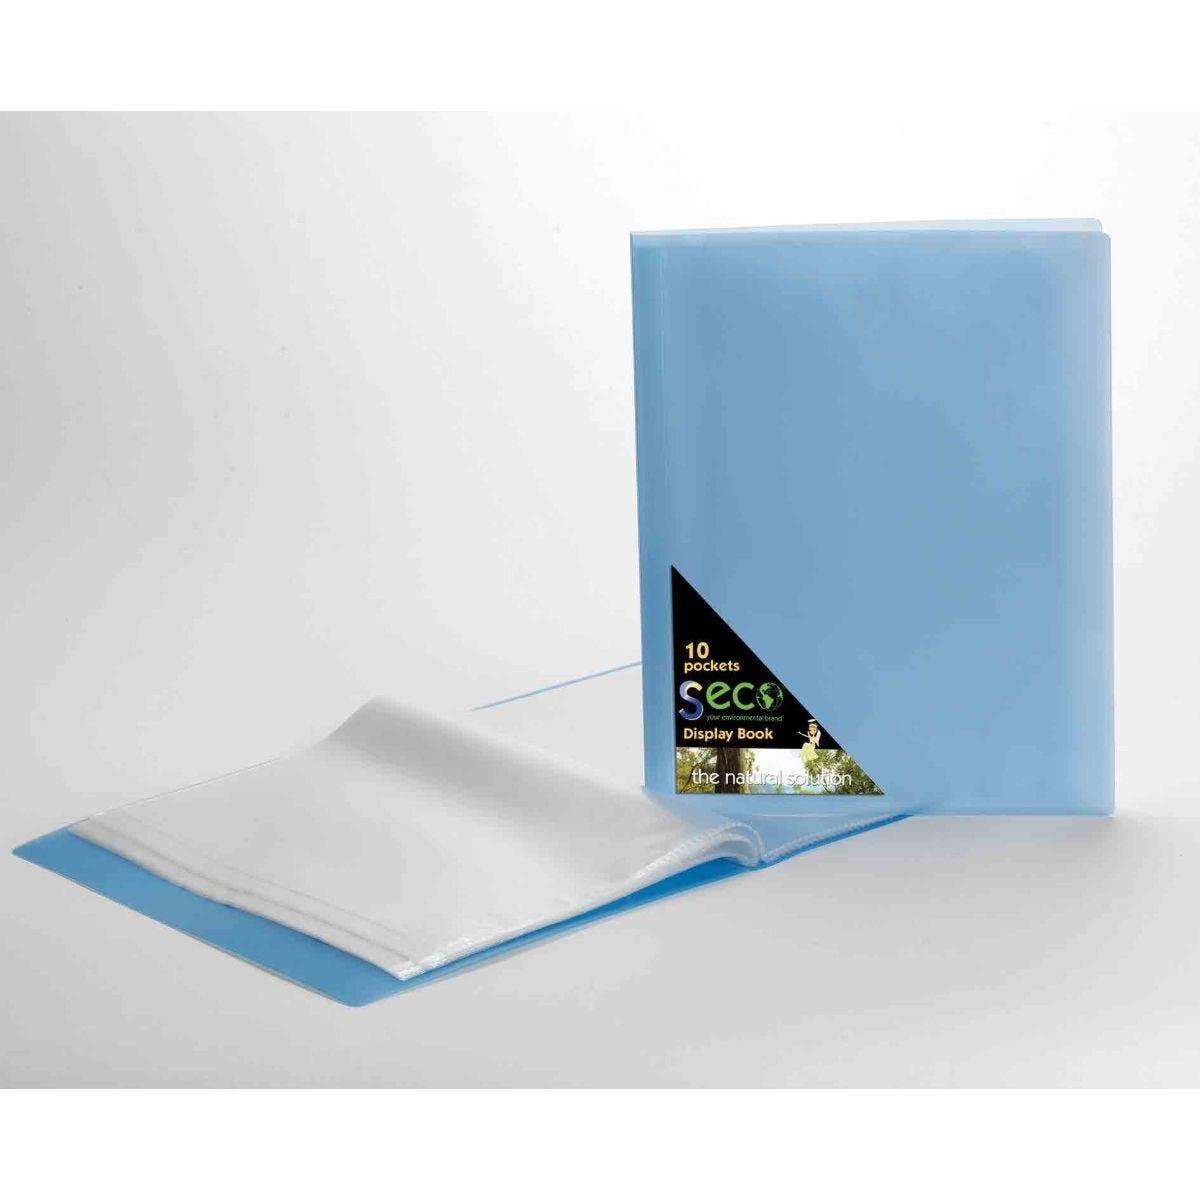 Seco Biodegradable Display Book A4 10 Pockets Blue